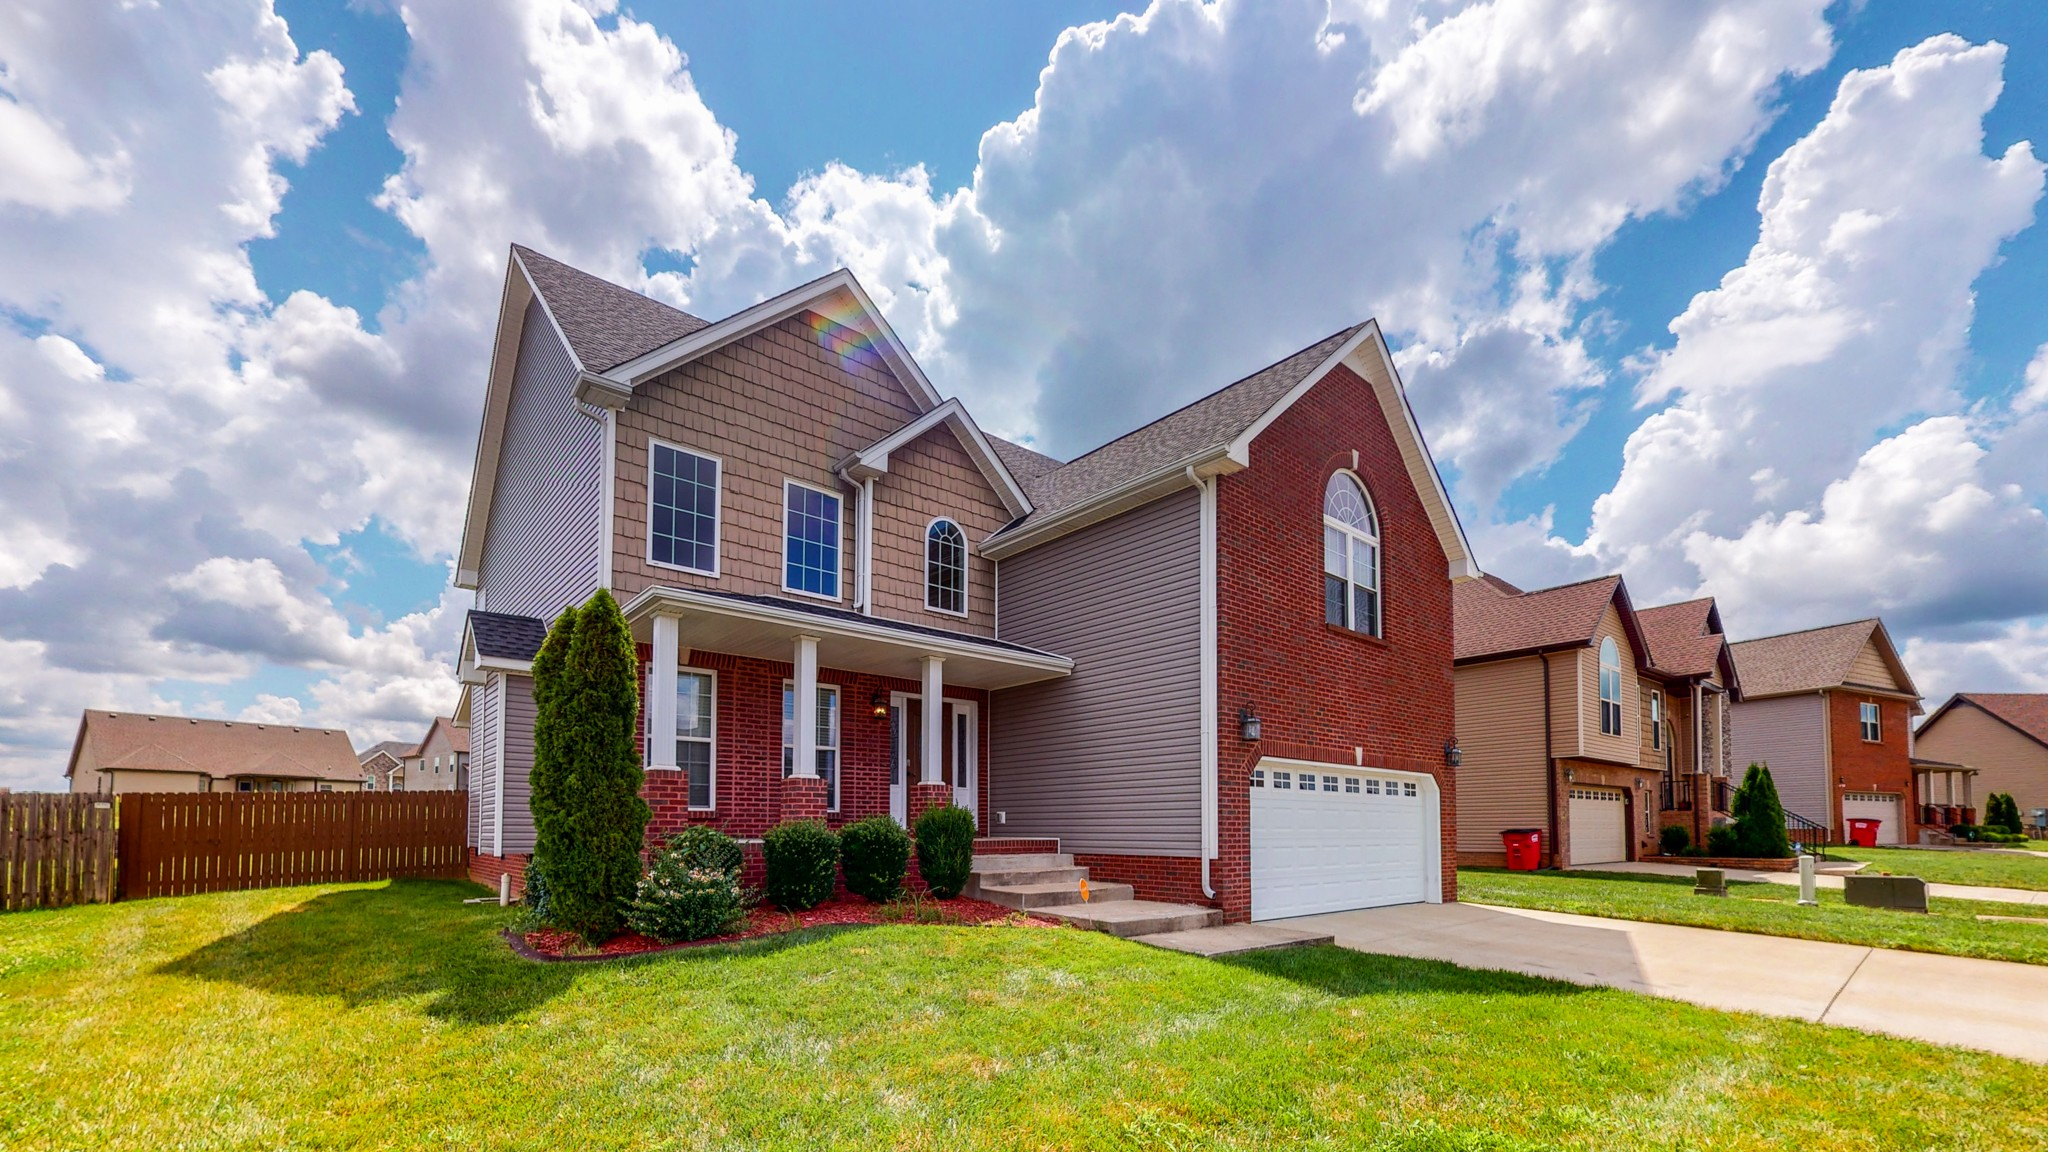 1769 Autumnwood Blvd Property Photo - Clarksville, TN real estate listing